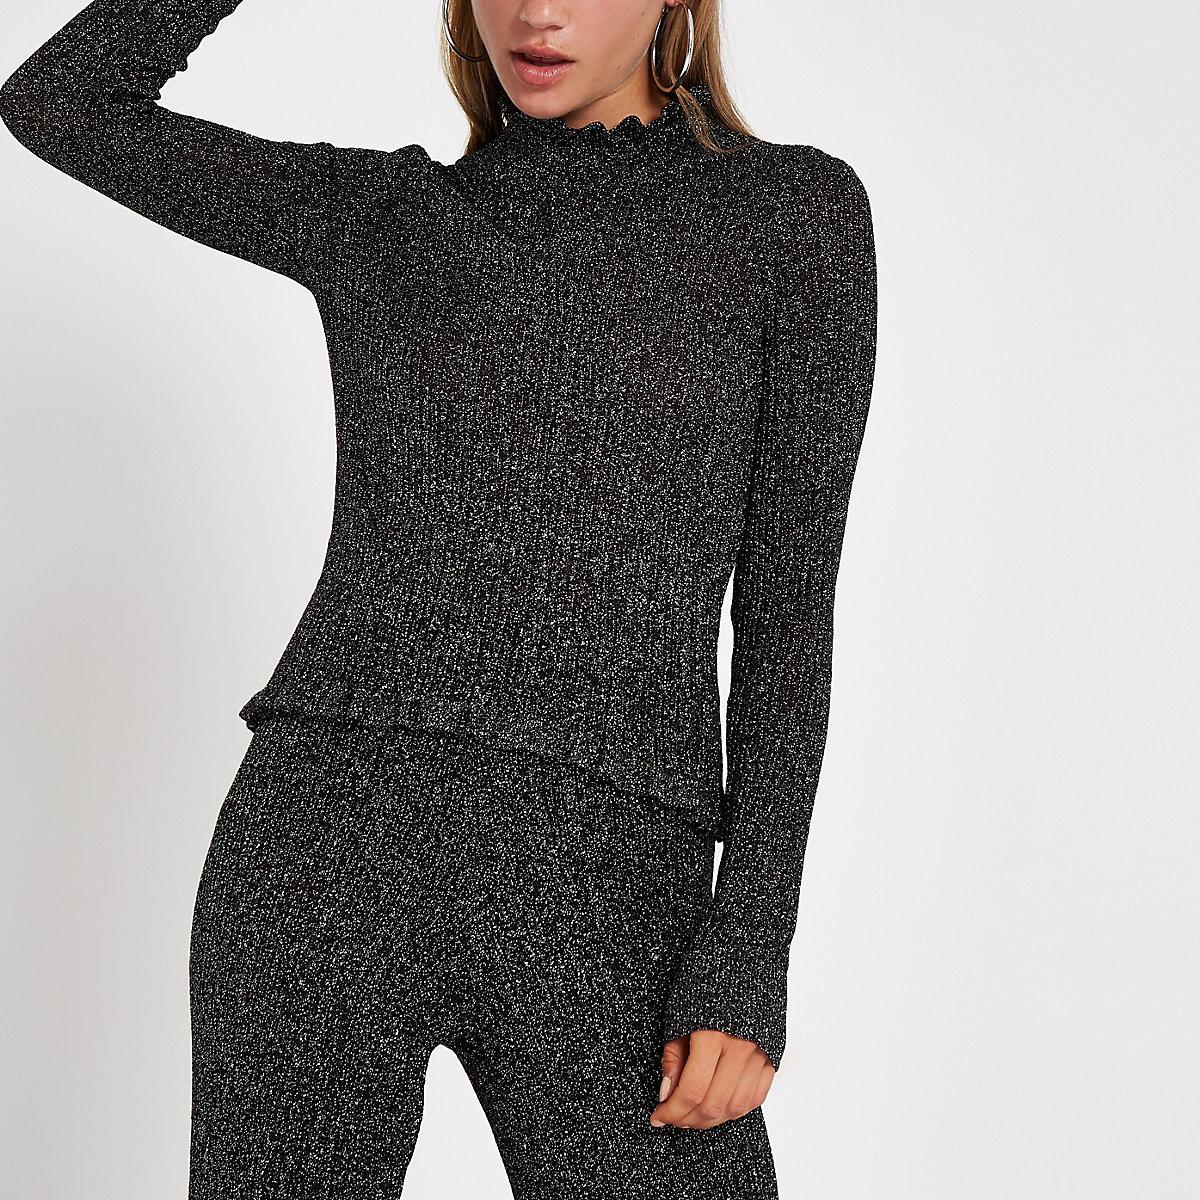 Black knit metallic high neck top